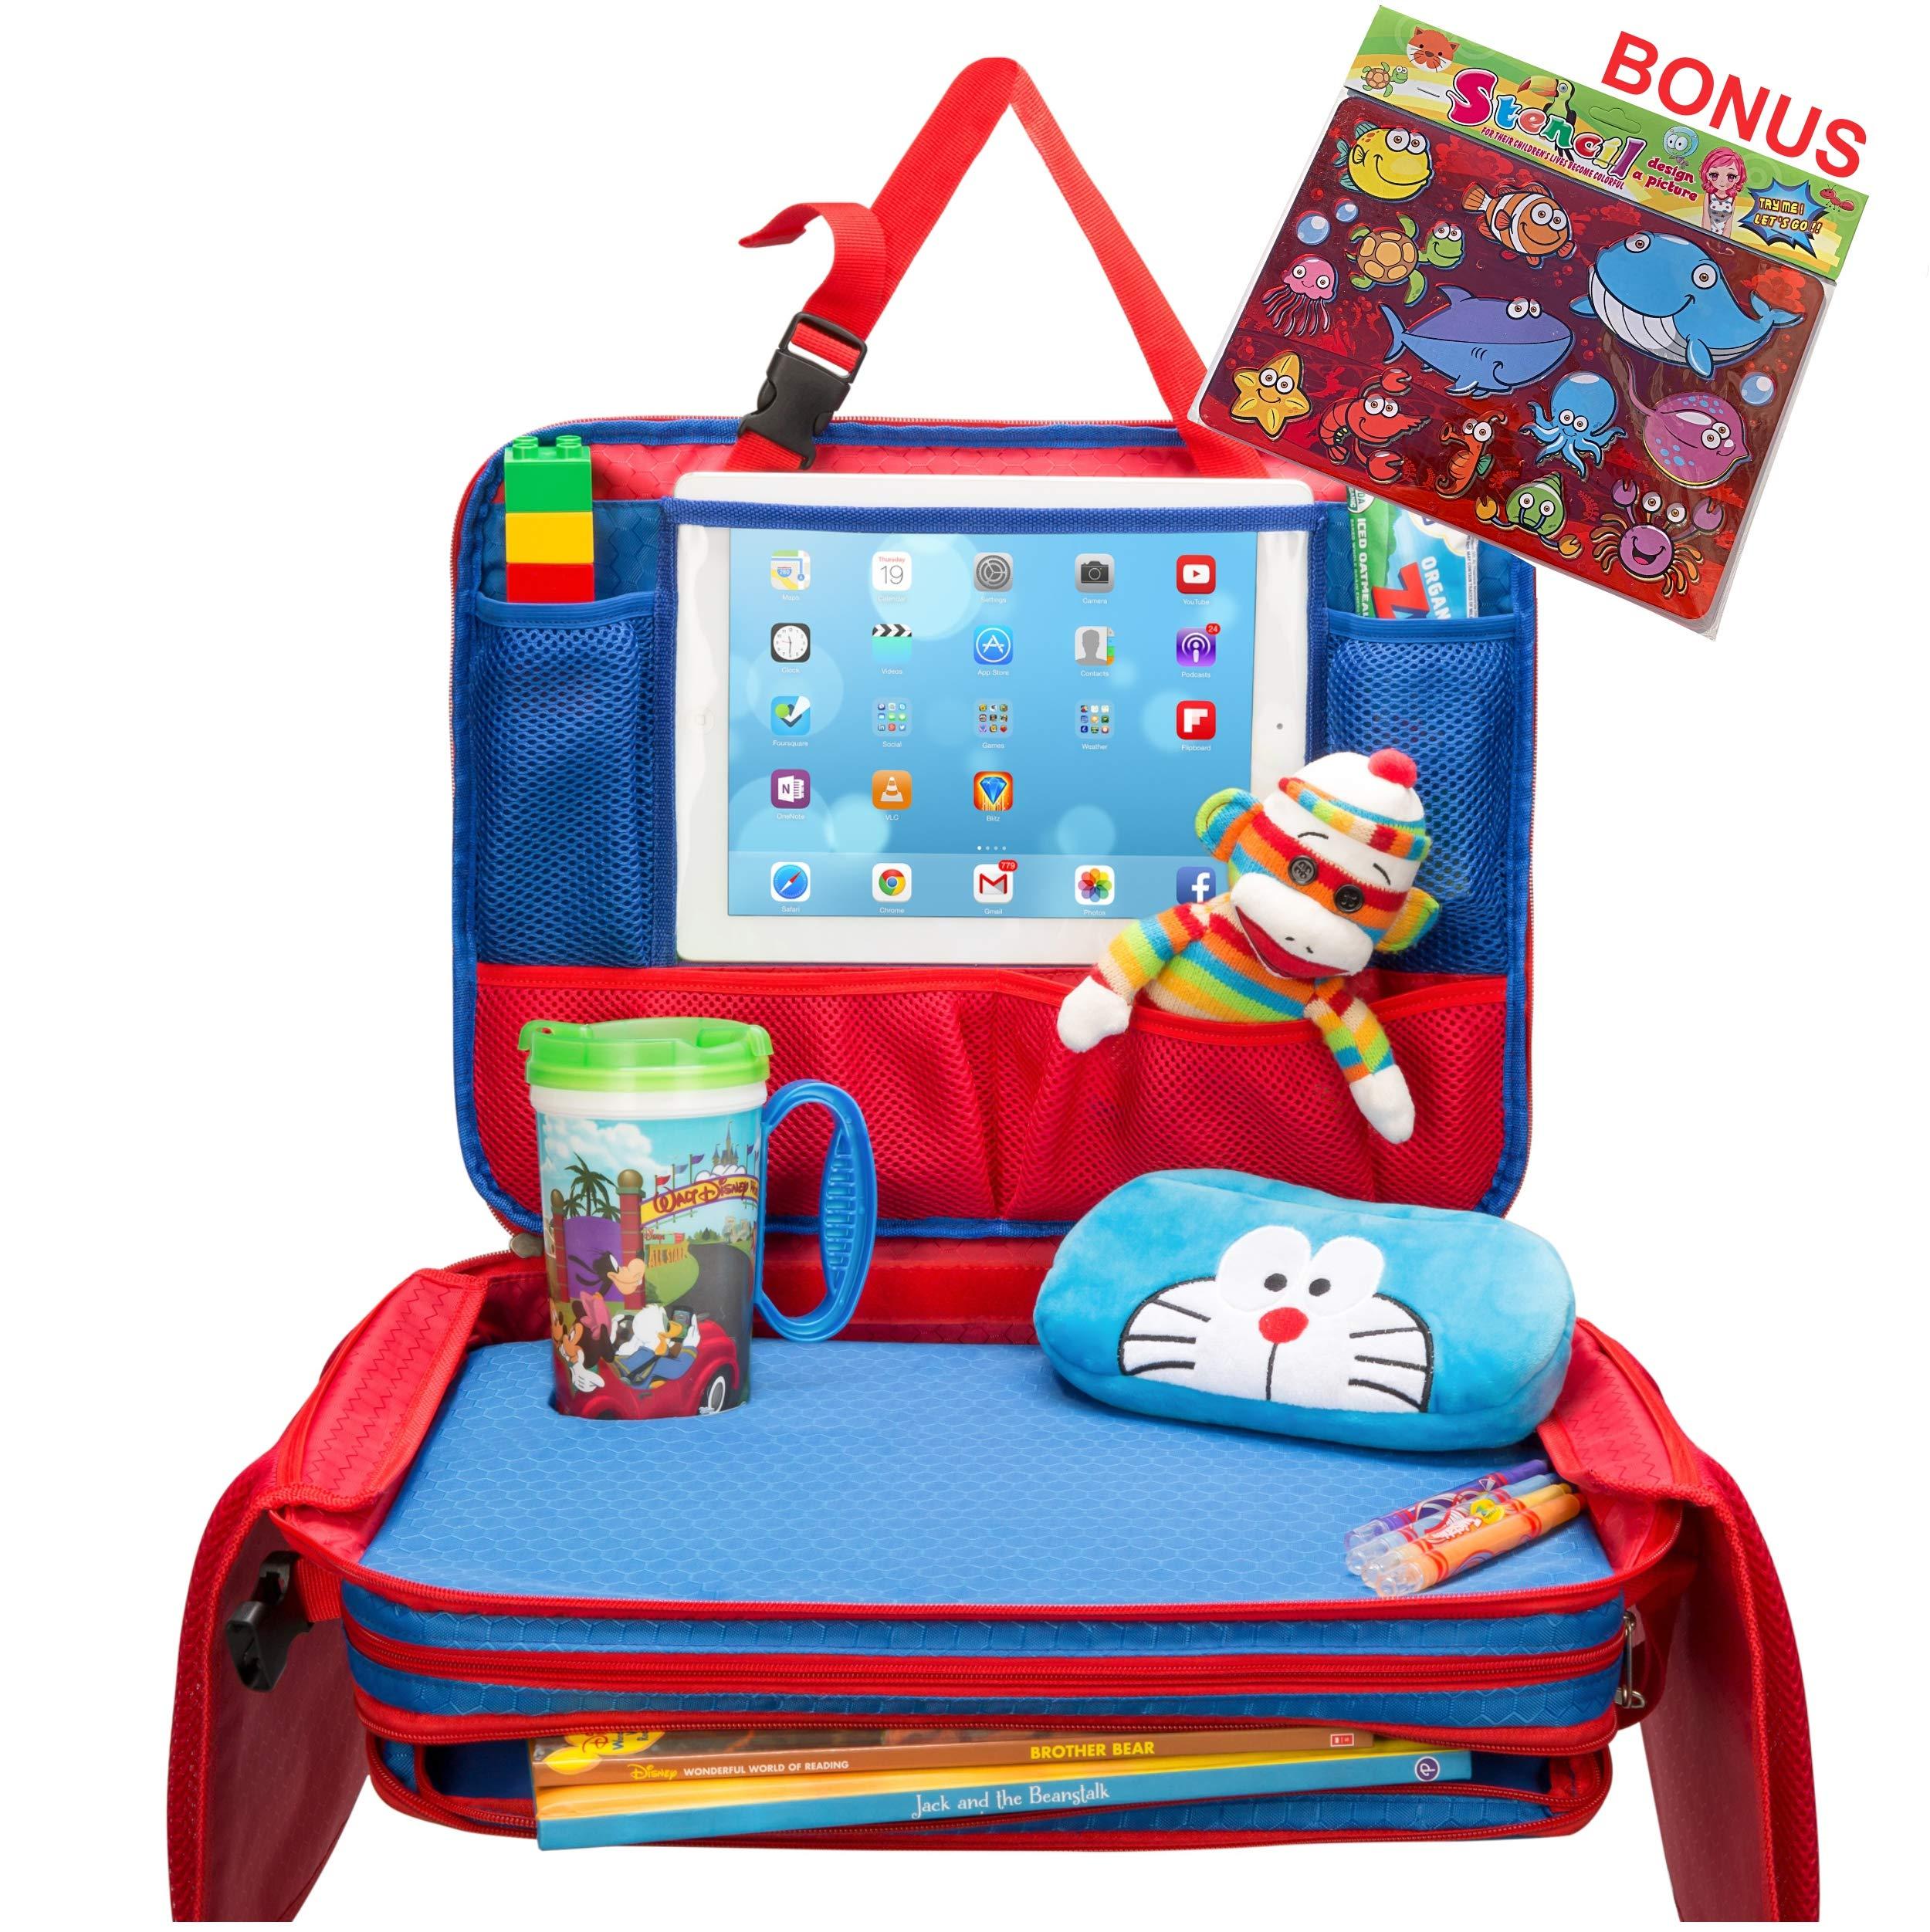 Amazon.com  Kids Travel Tray - Detachable Top 4-in-1 Car Organizer w ... 62ecc2695e